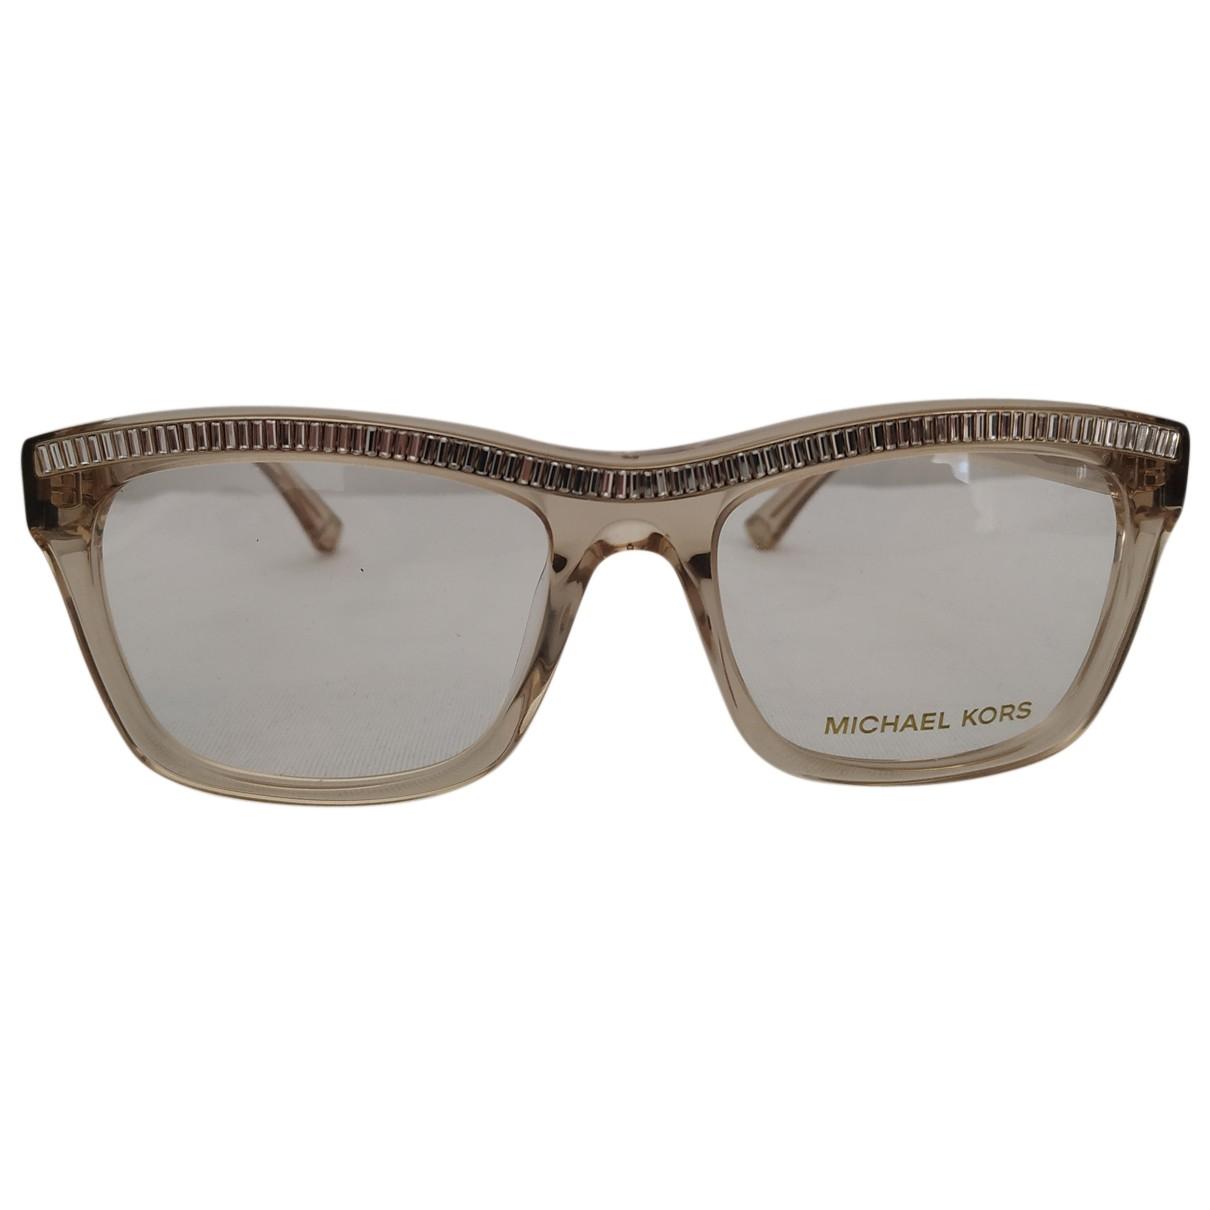 Michael Kors N Beige Sunglasses for Women N